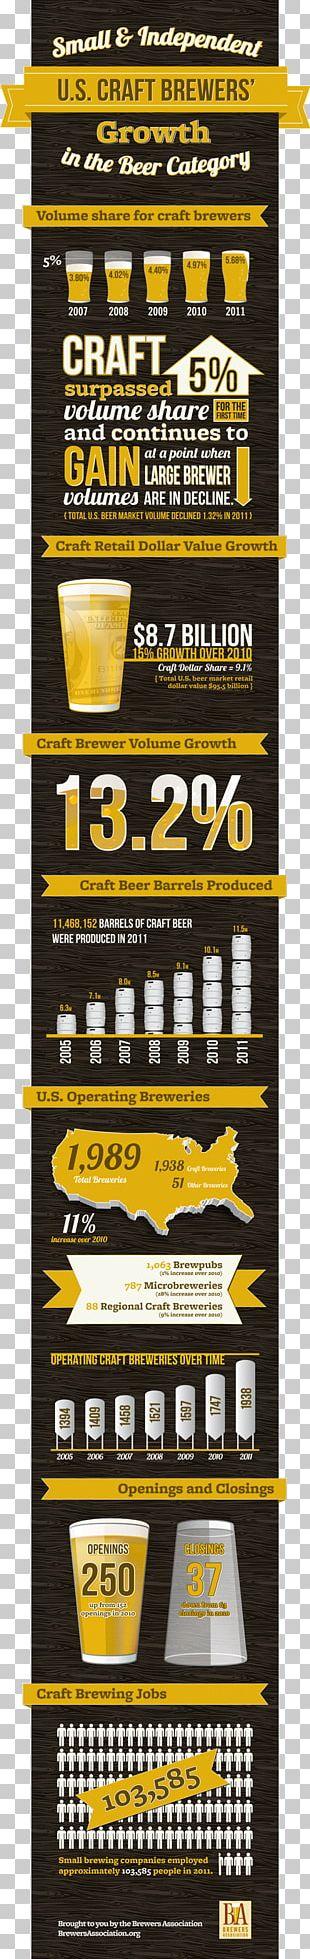 Craft Beer Brewers Association Beer Brewing Grains & Malts Brewery PNG